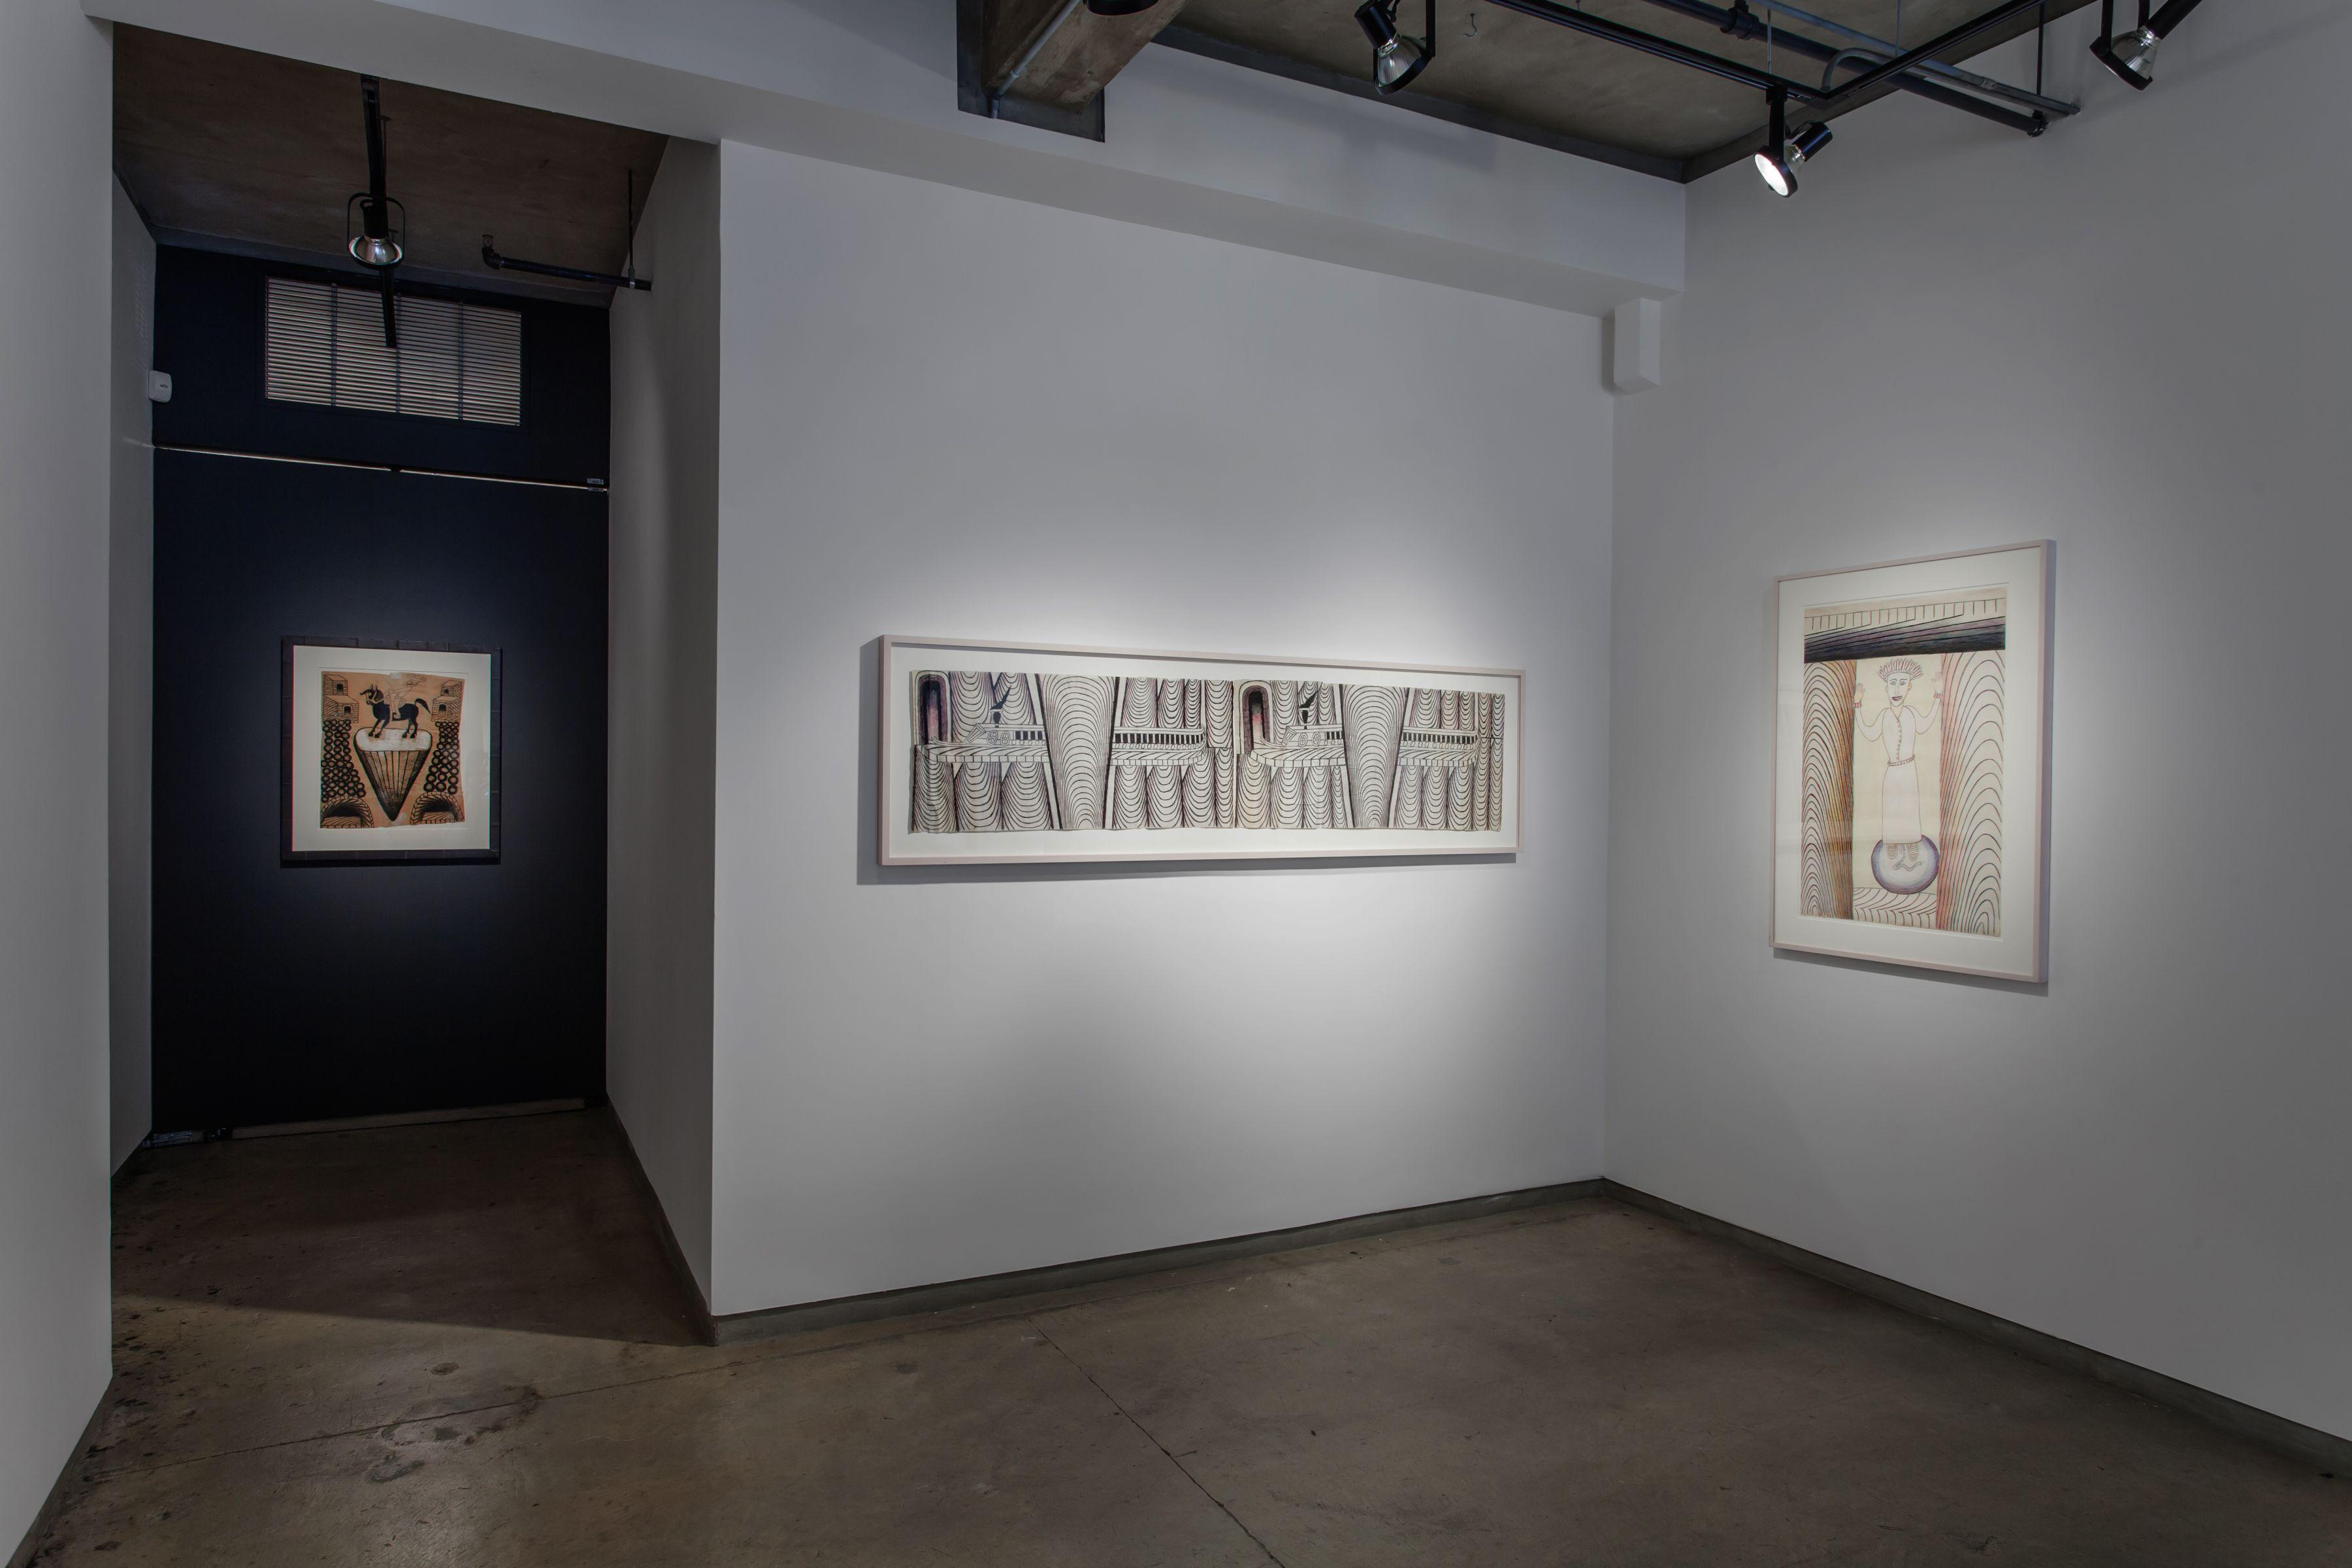 Installation views, Martín Ramírez at Ricco/Maresca GalleryCourtesy of Ricco/Maresca Gallery